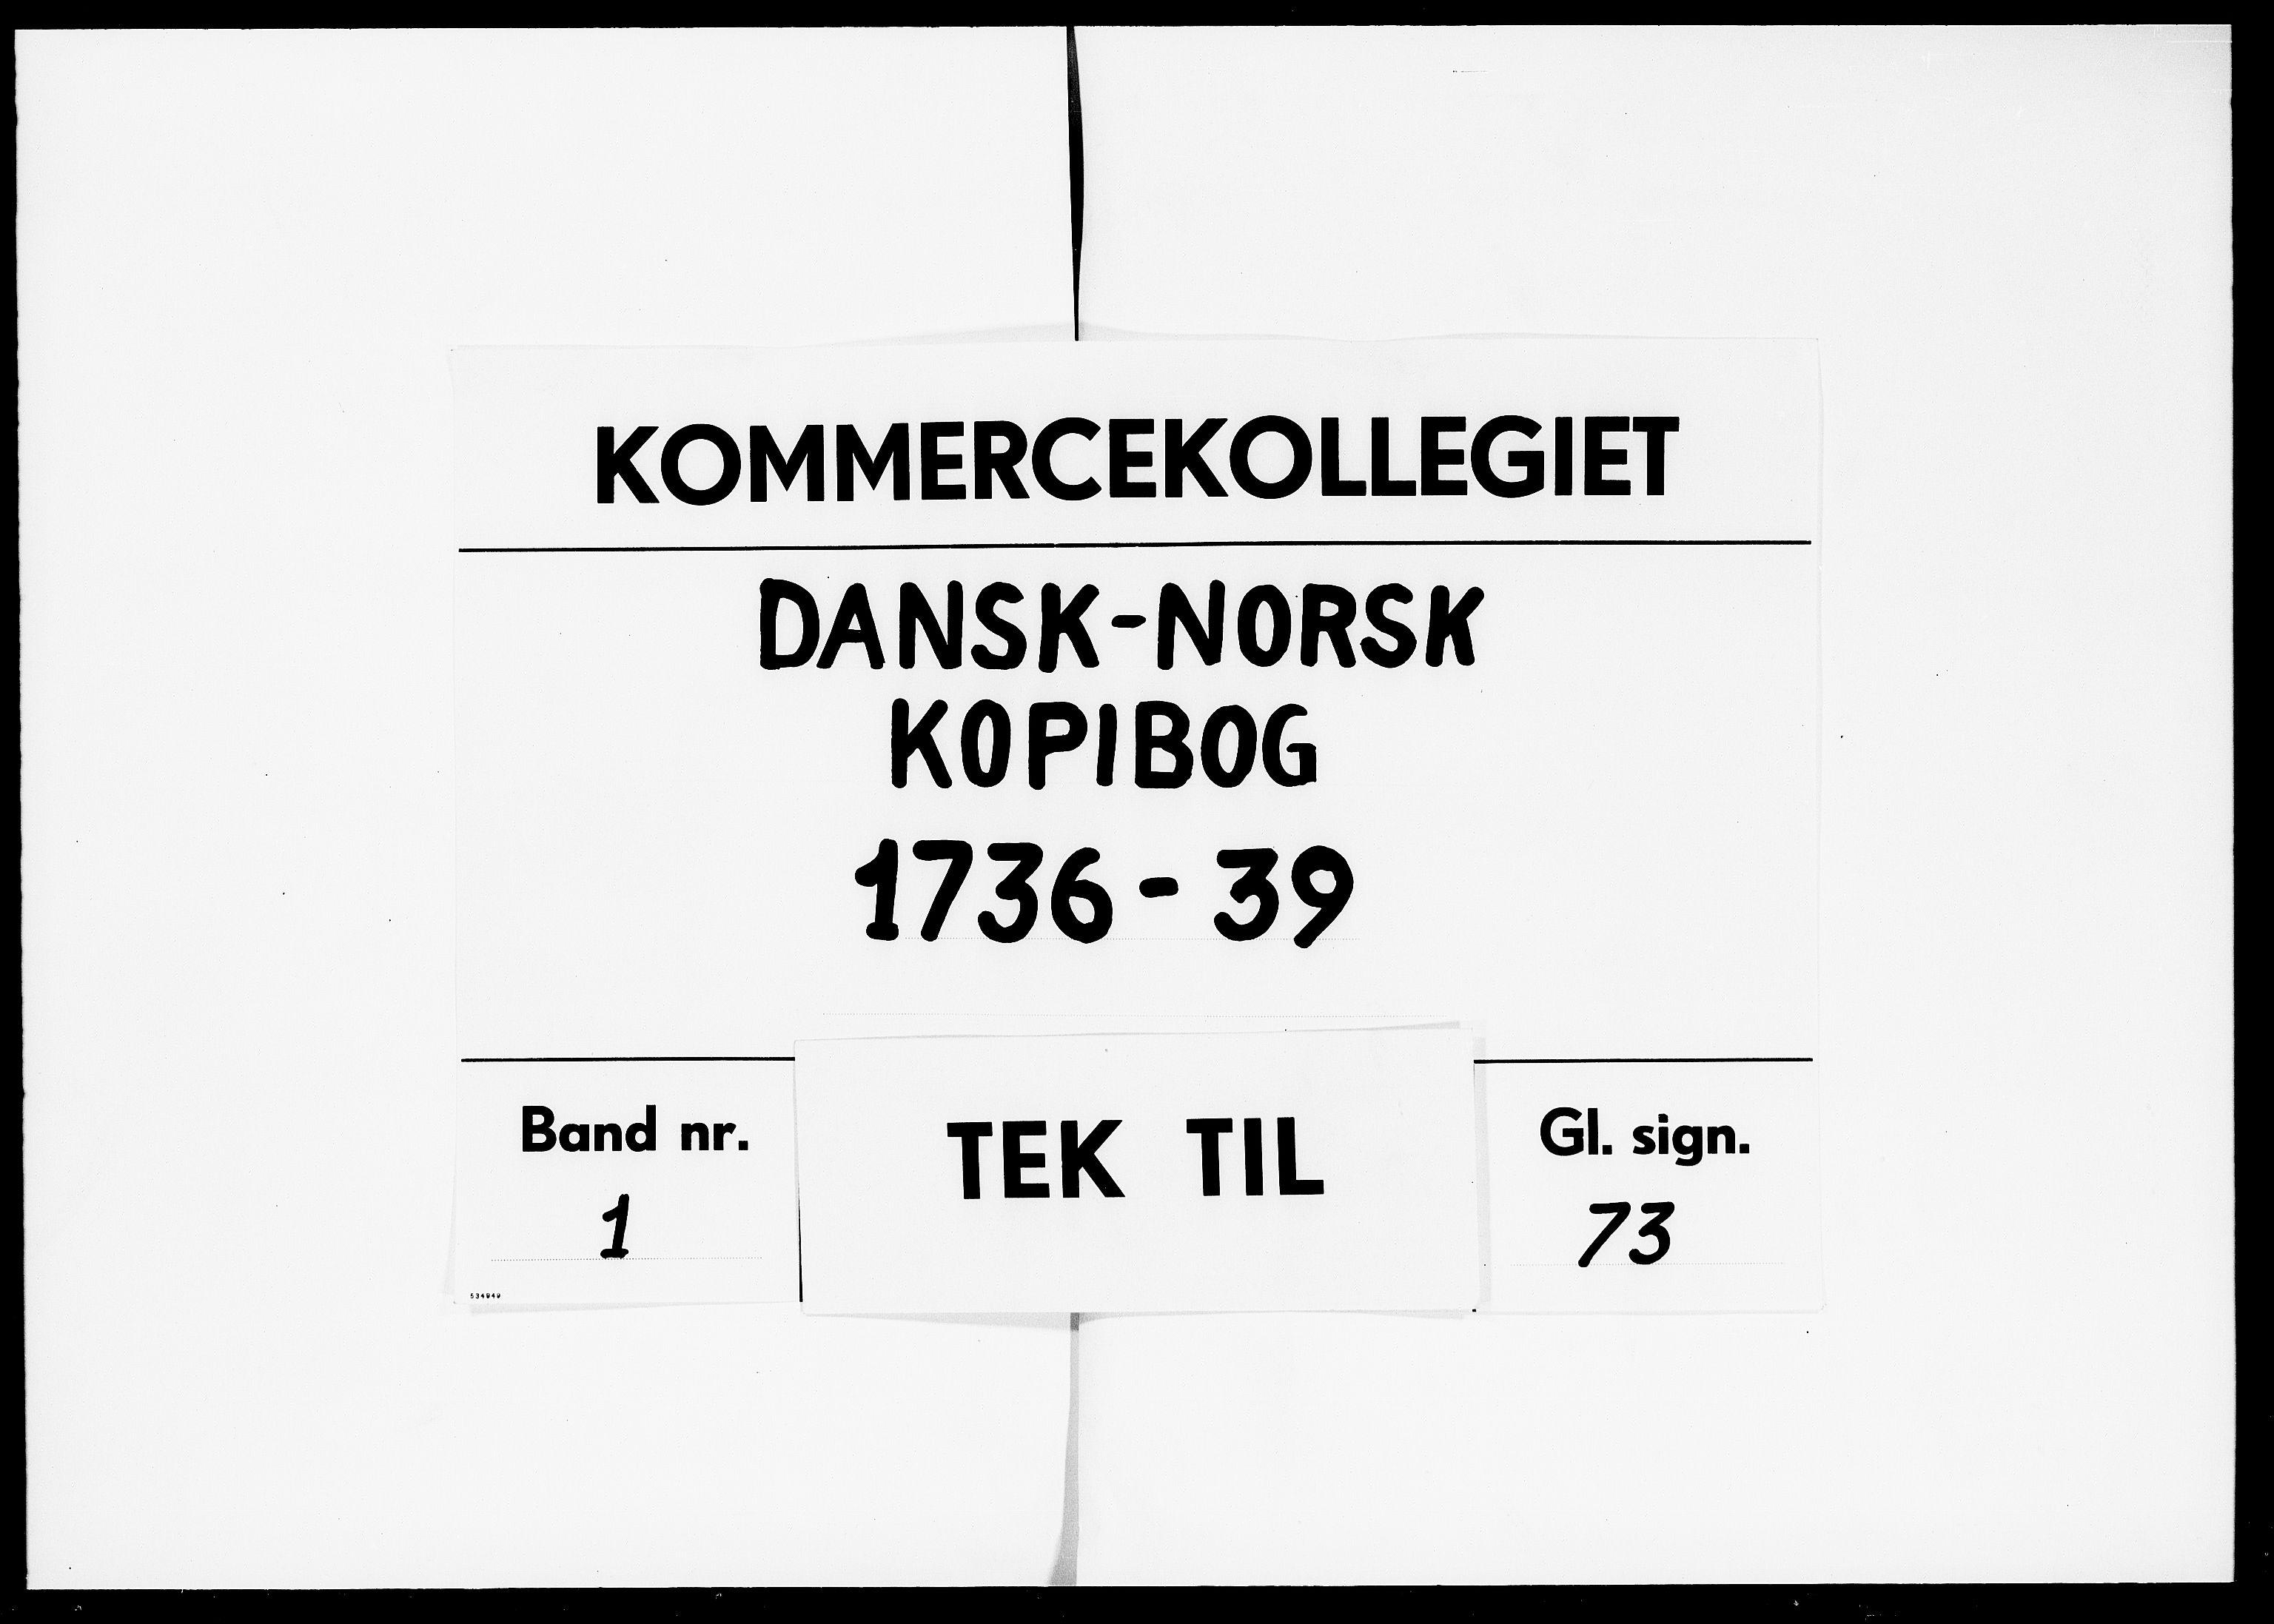 DRA, Kommercekollegiet, Dansk-Norske Sekretariat, -/41: Dansk-Norsk kopibog, 1736-1739